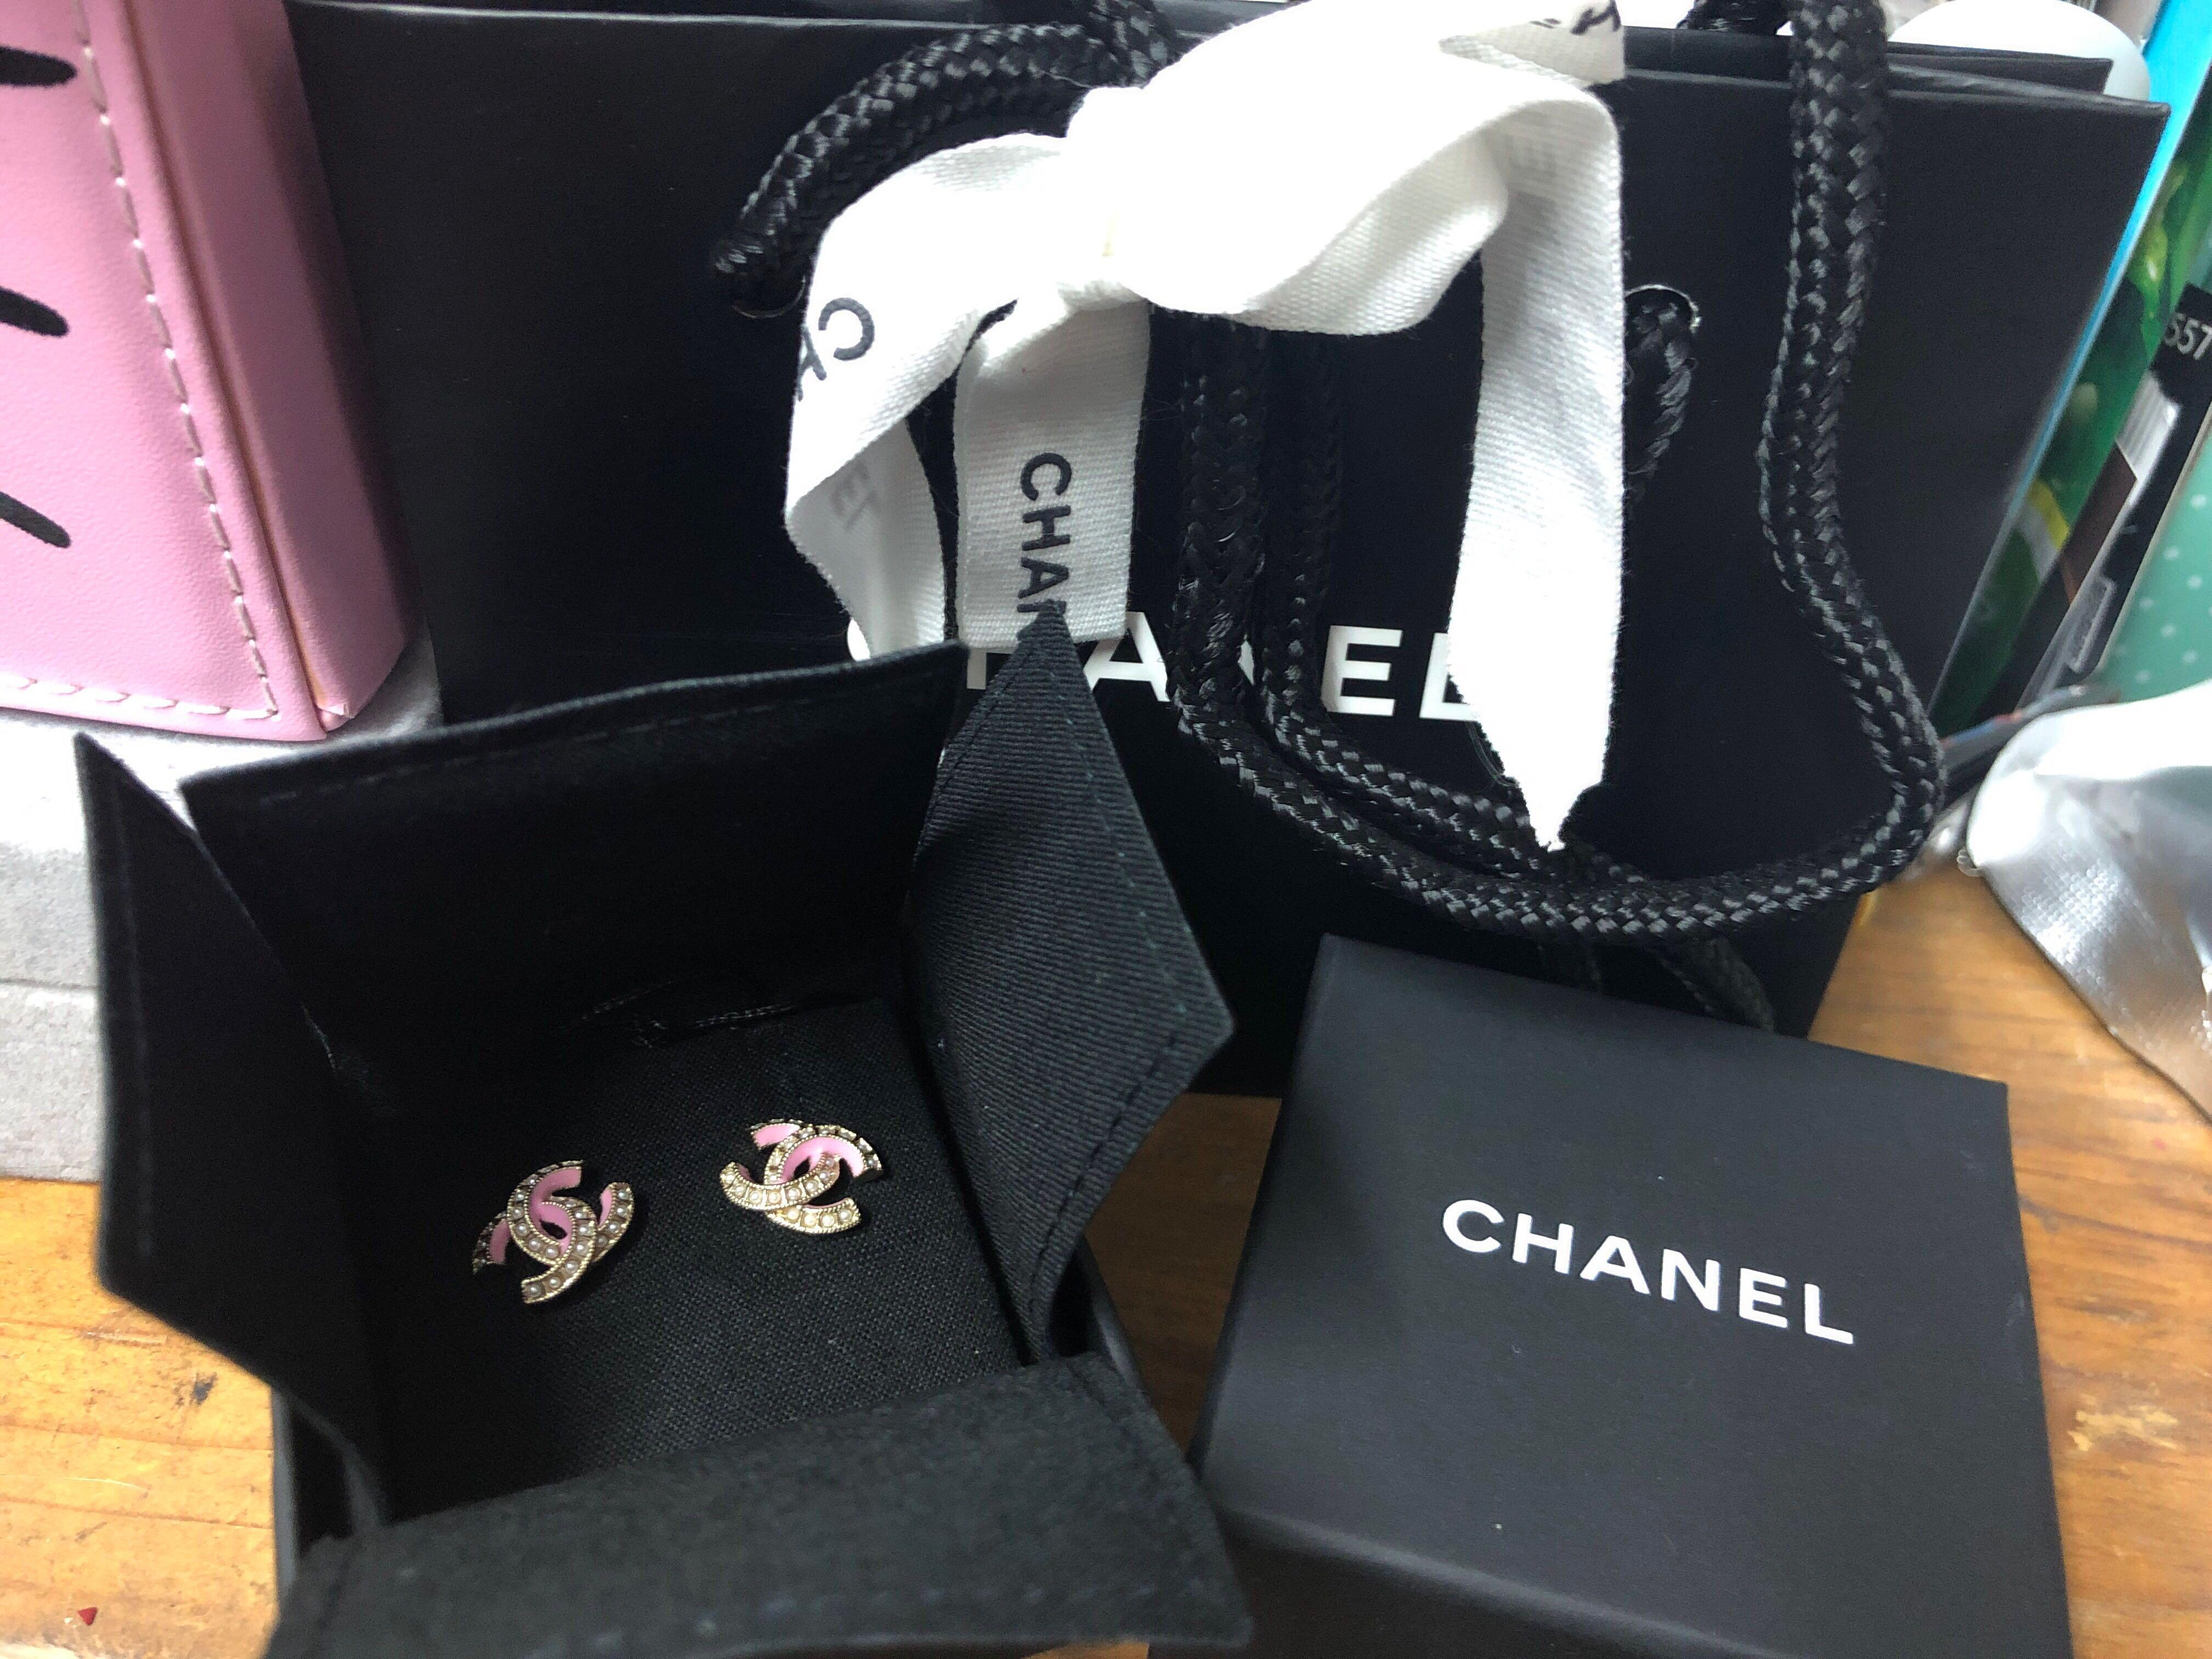 Chanel 耳環 2019 Chanel earrings  Chanel粉紅色珍珠耳環